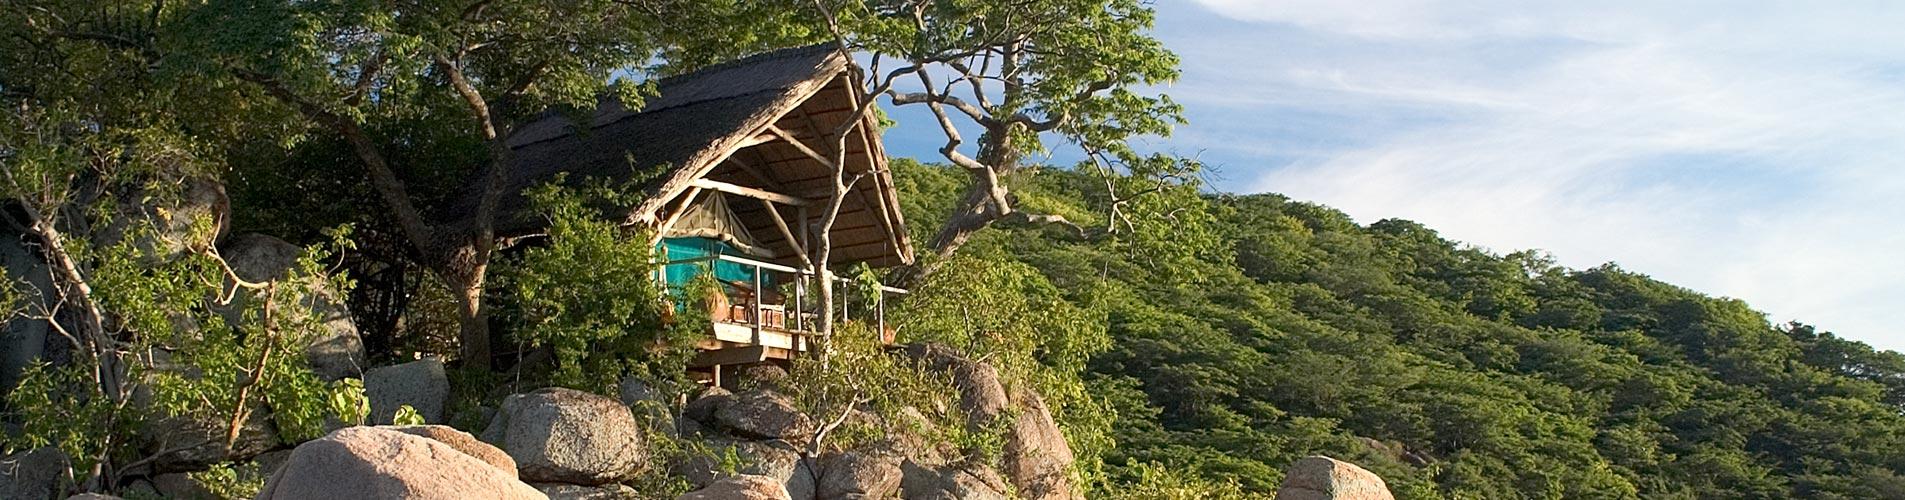 Malawi Safaris Mumbo Island Tent